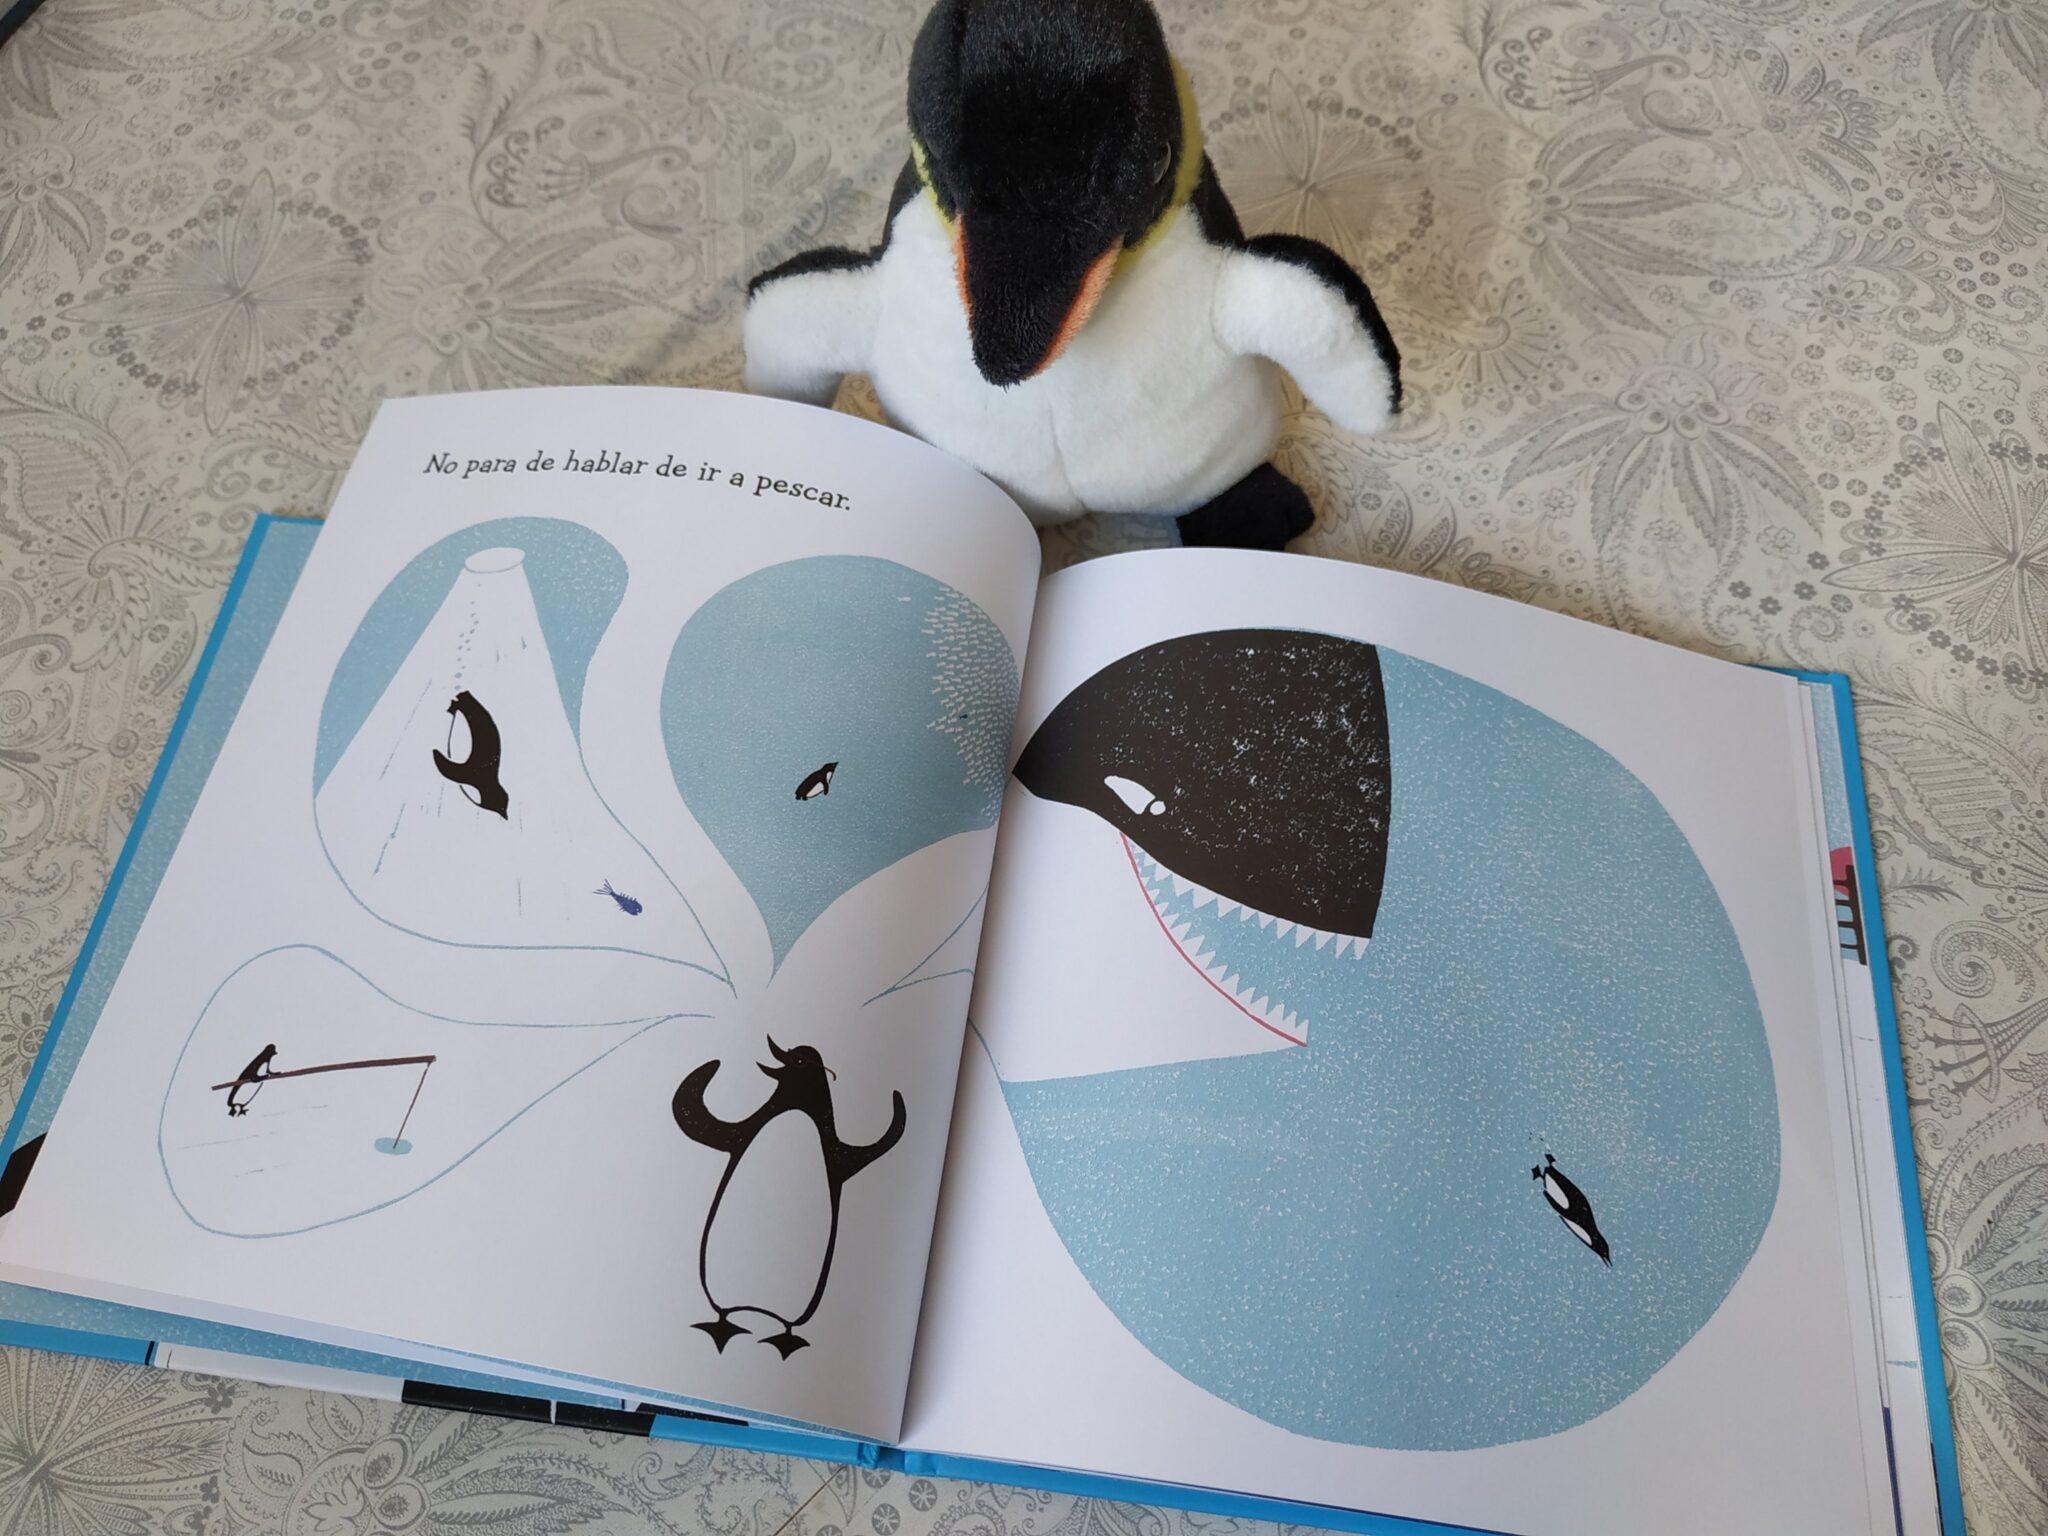 img 20191115 1133271066120375265899161 scaled - Mi abuelo es un pingüino